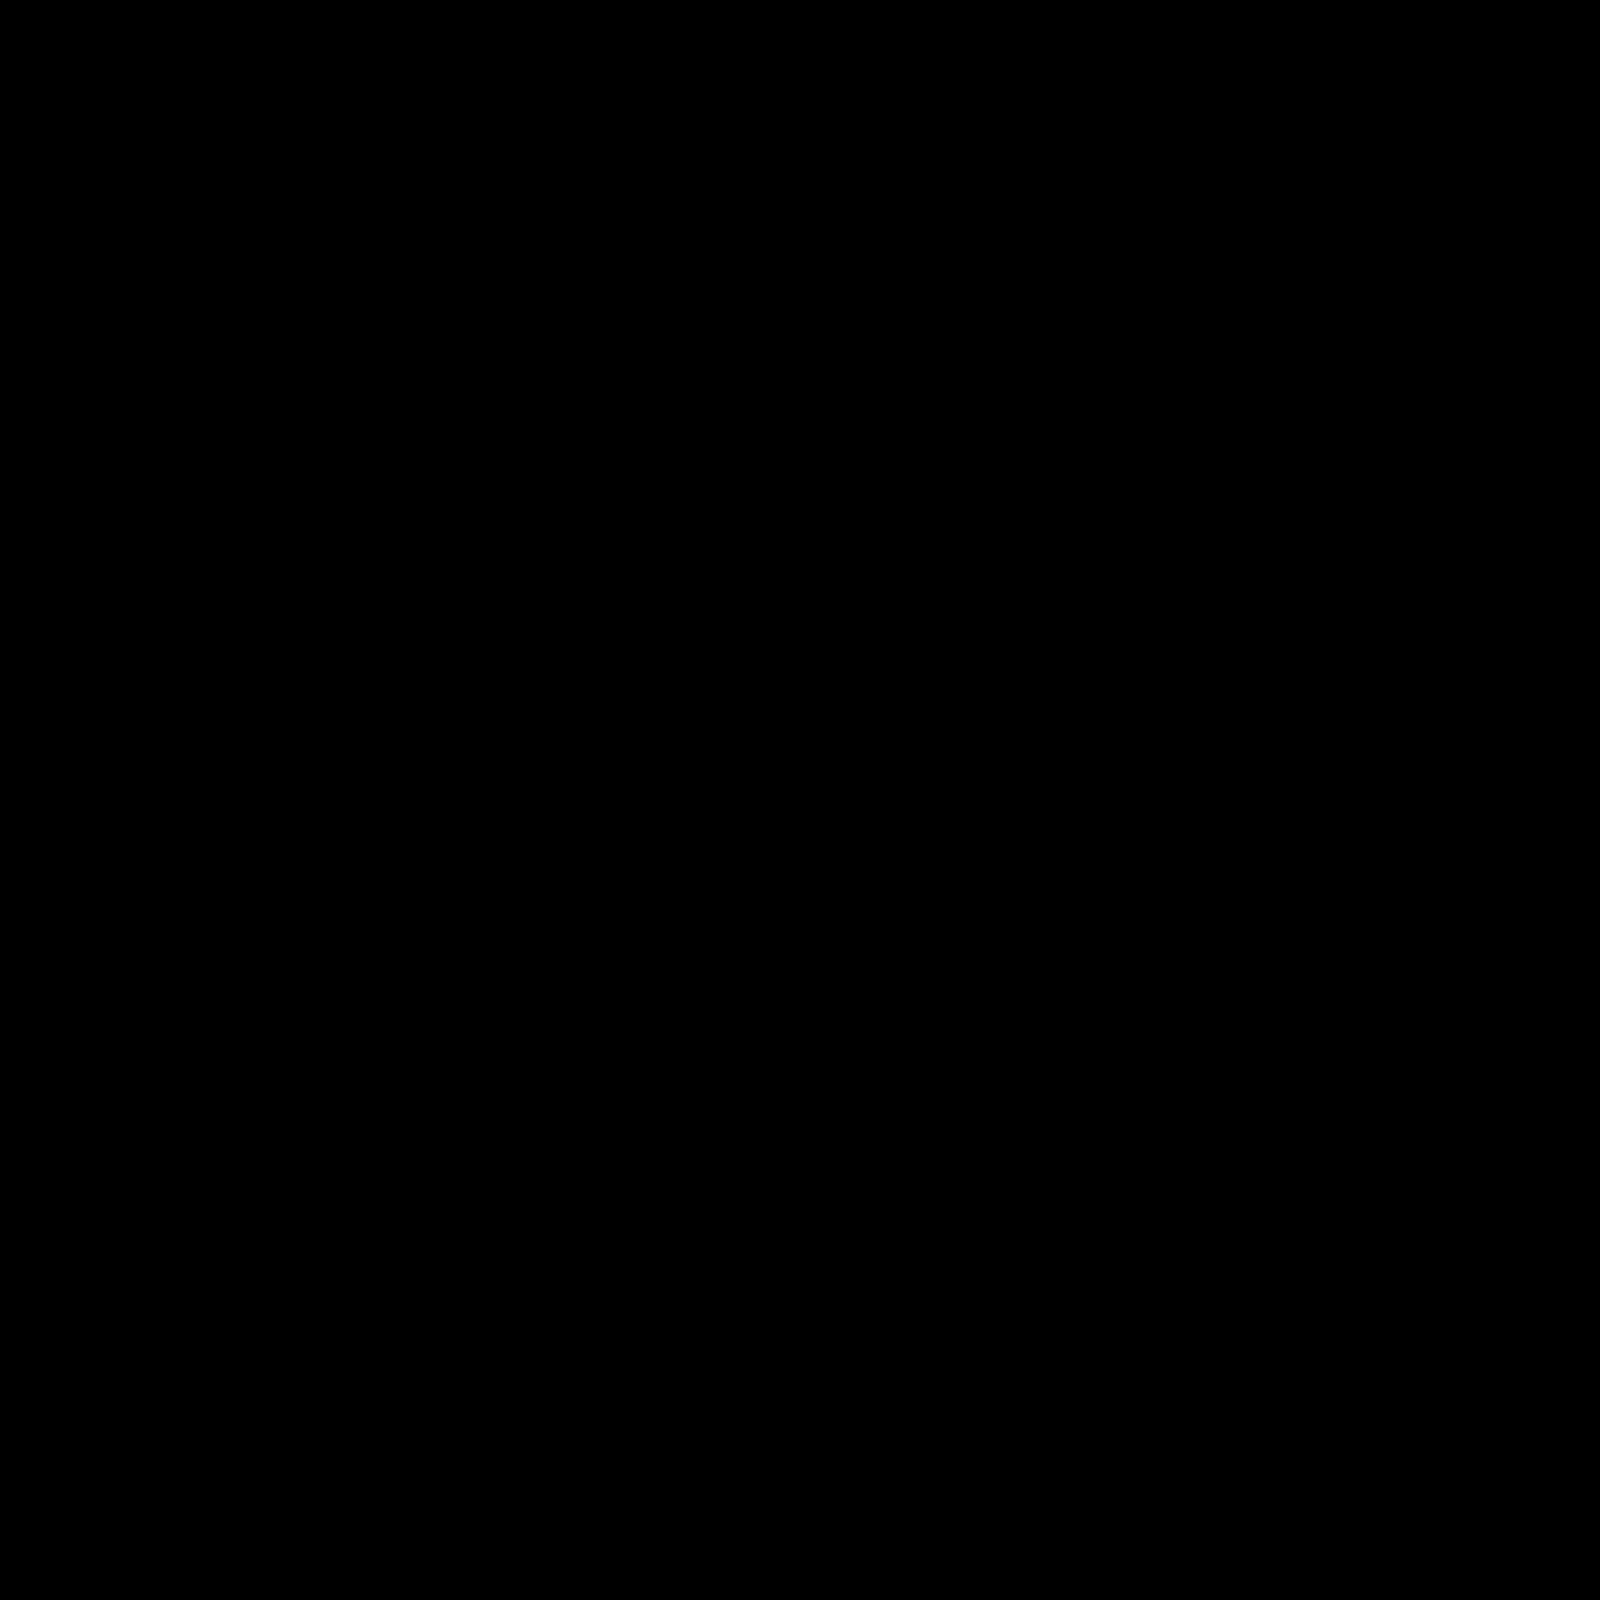 Amazon logo PNG images free download.